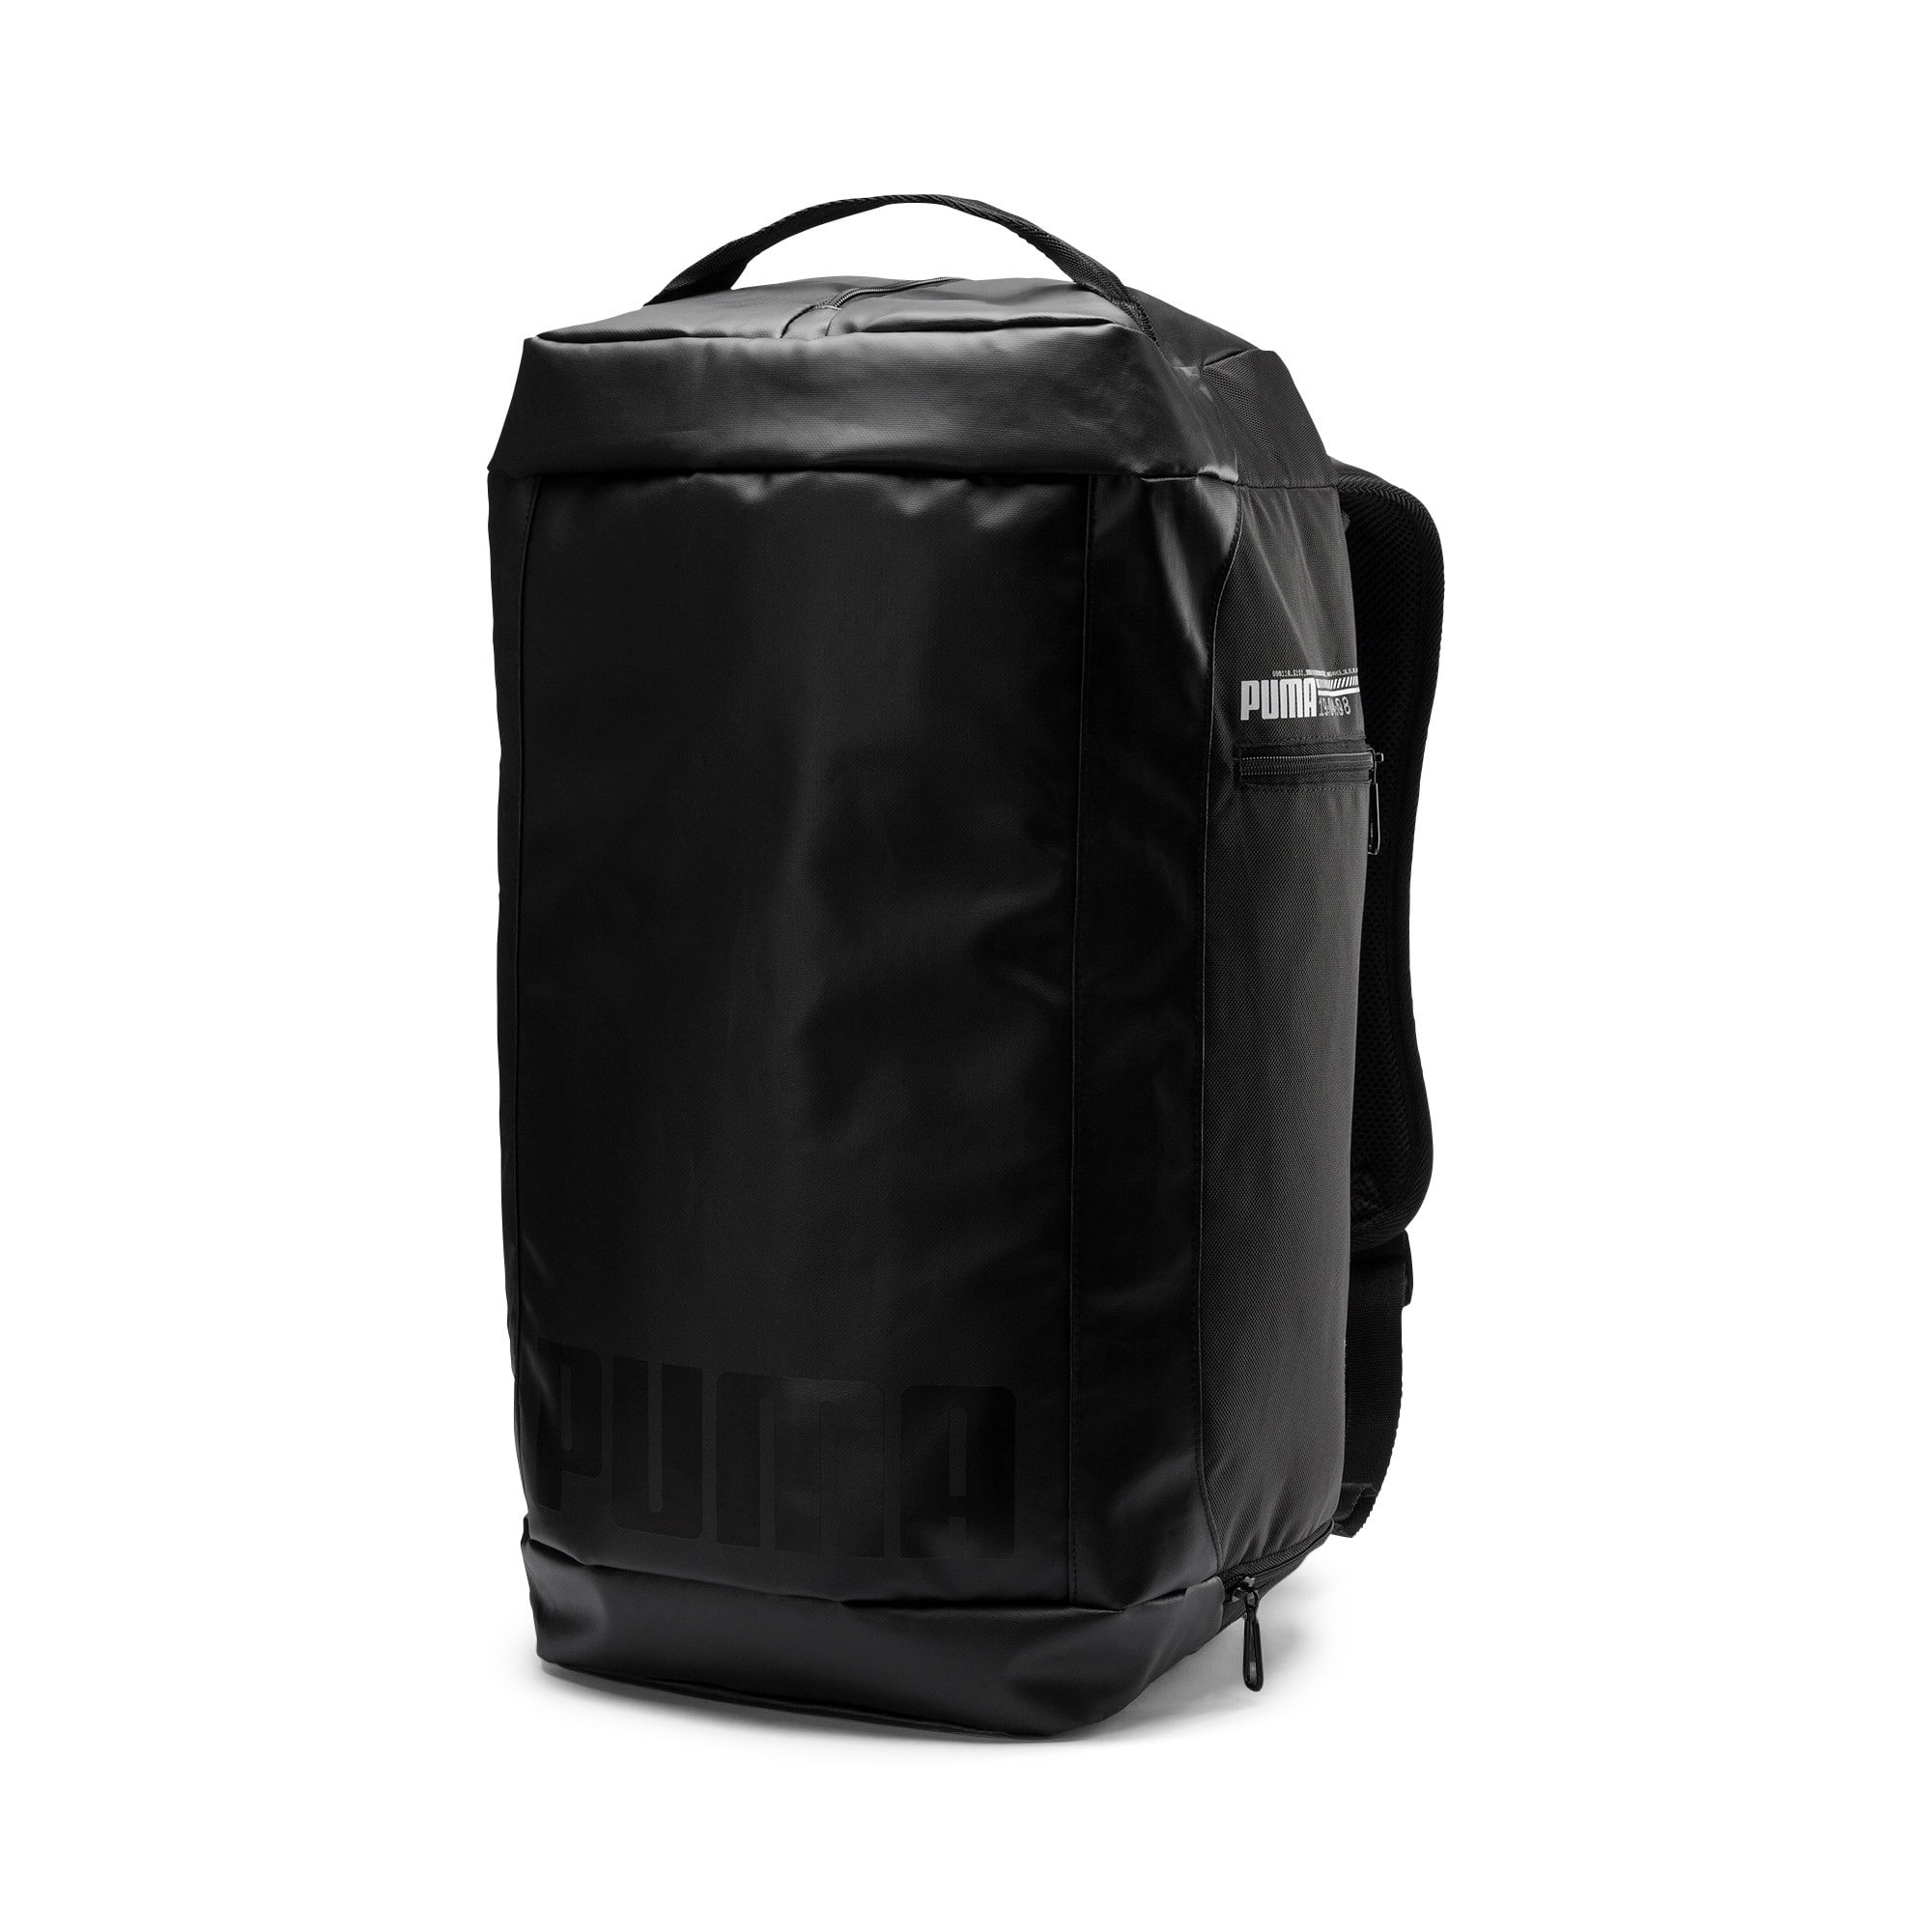 Thumbnail 2 of Energy Two-Way Duffel Bag, Puma Black, medium-IND